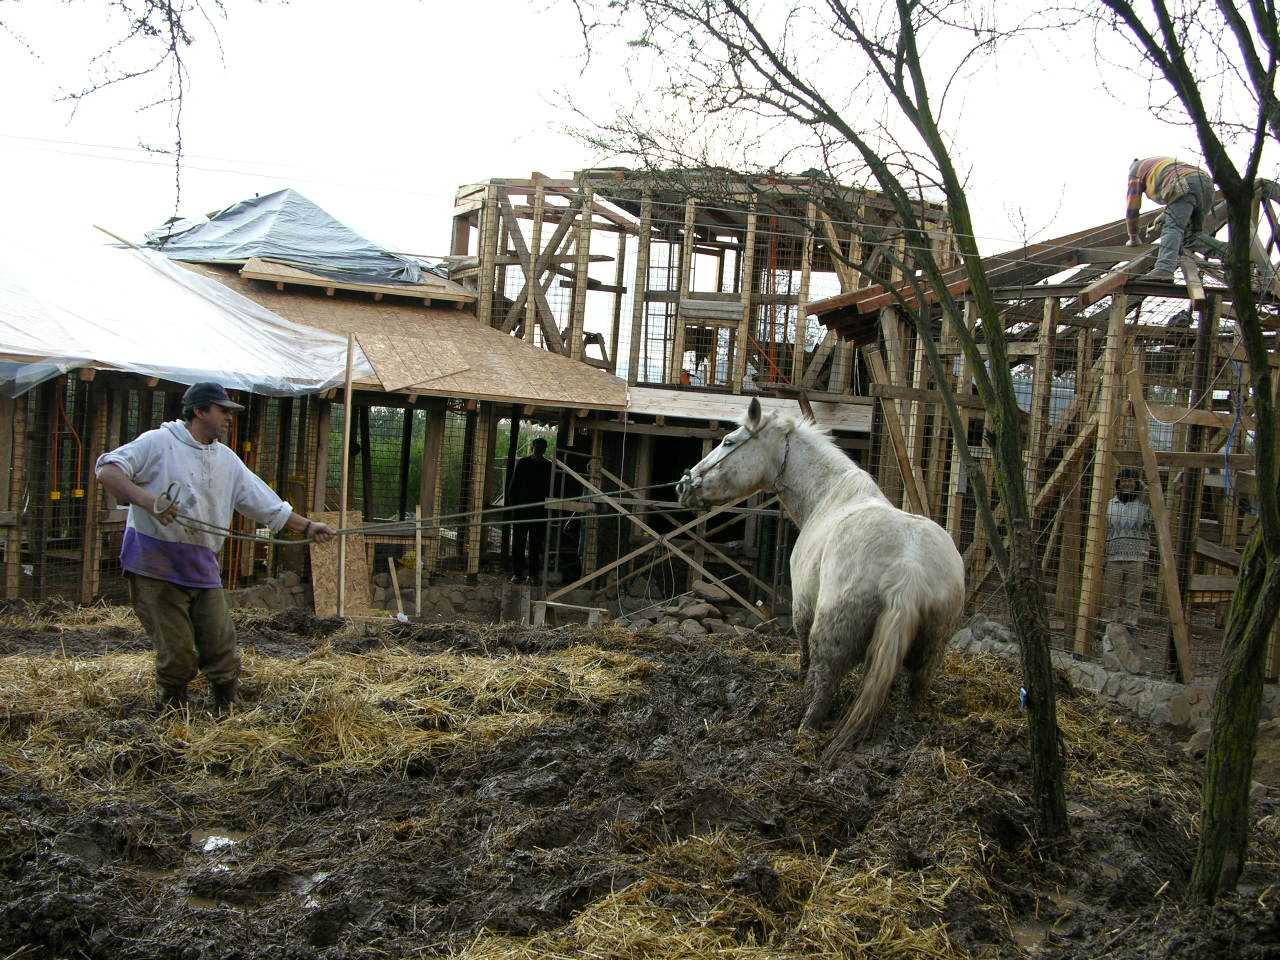 Casas de adobe..tecnica antisismica,comunidad Ecológica, Santiago,Chile